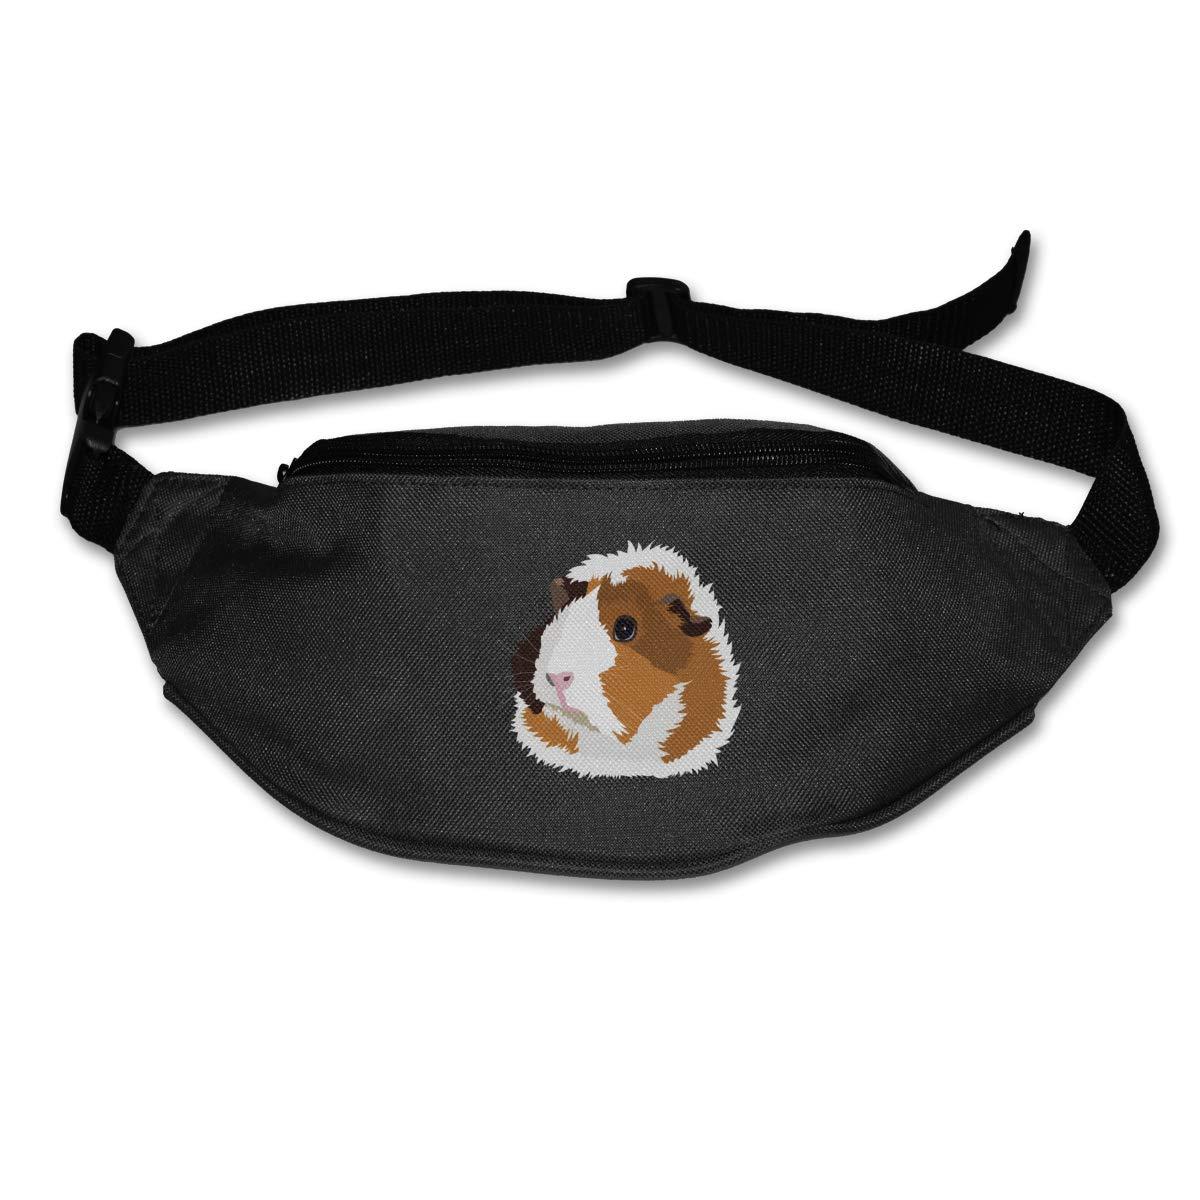 Cute Guinea Pig Sport Waist Pack Fanny Pack Adjustable For Run